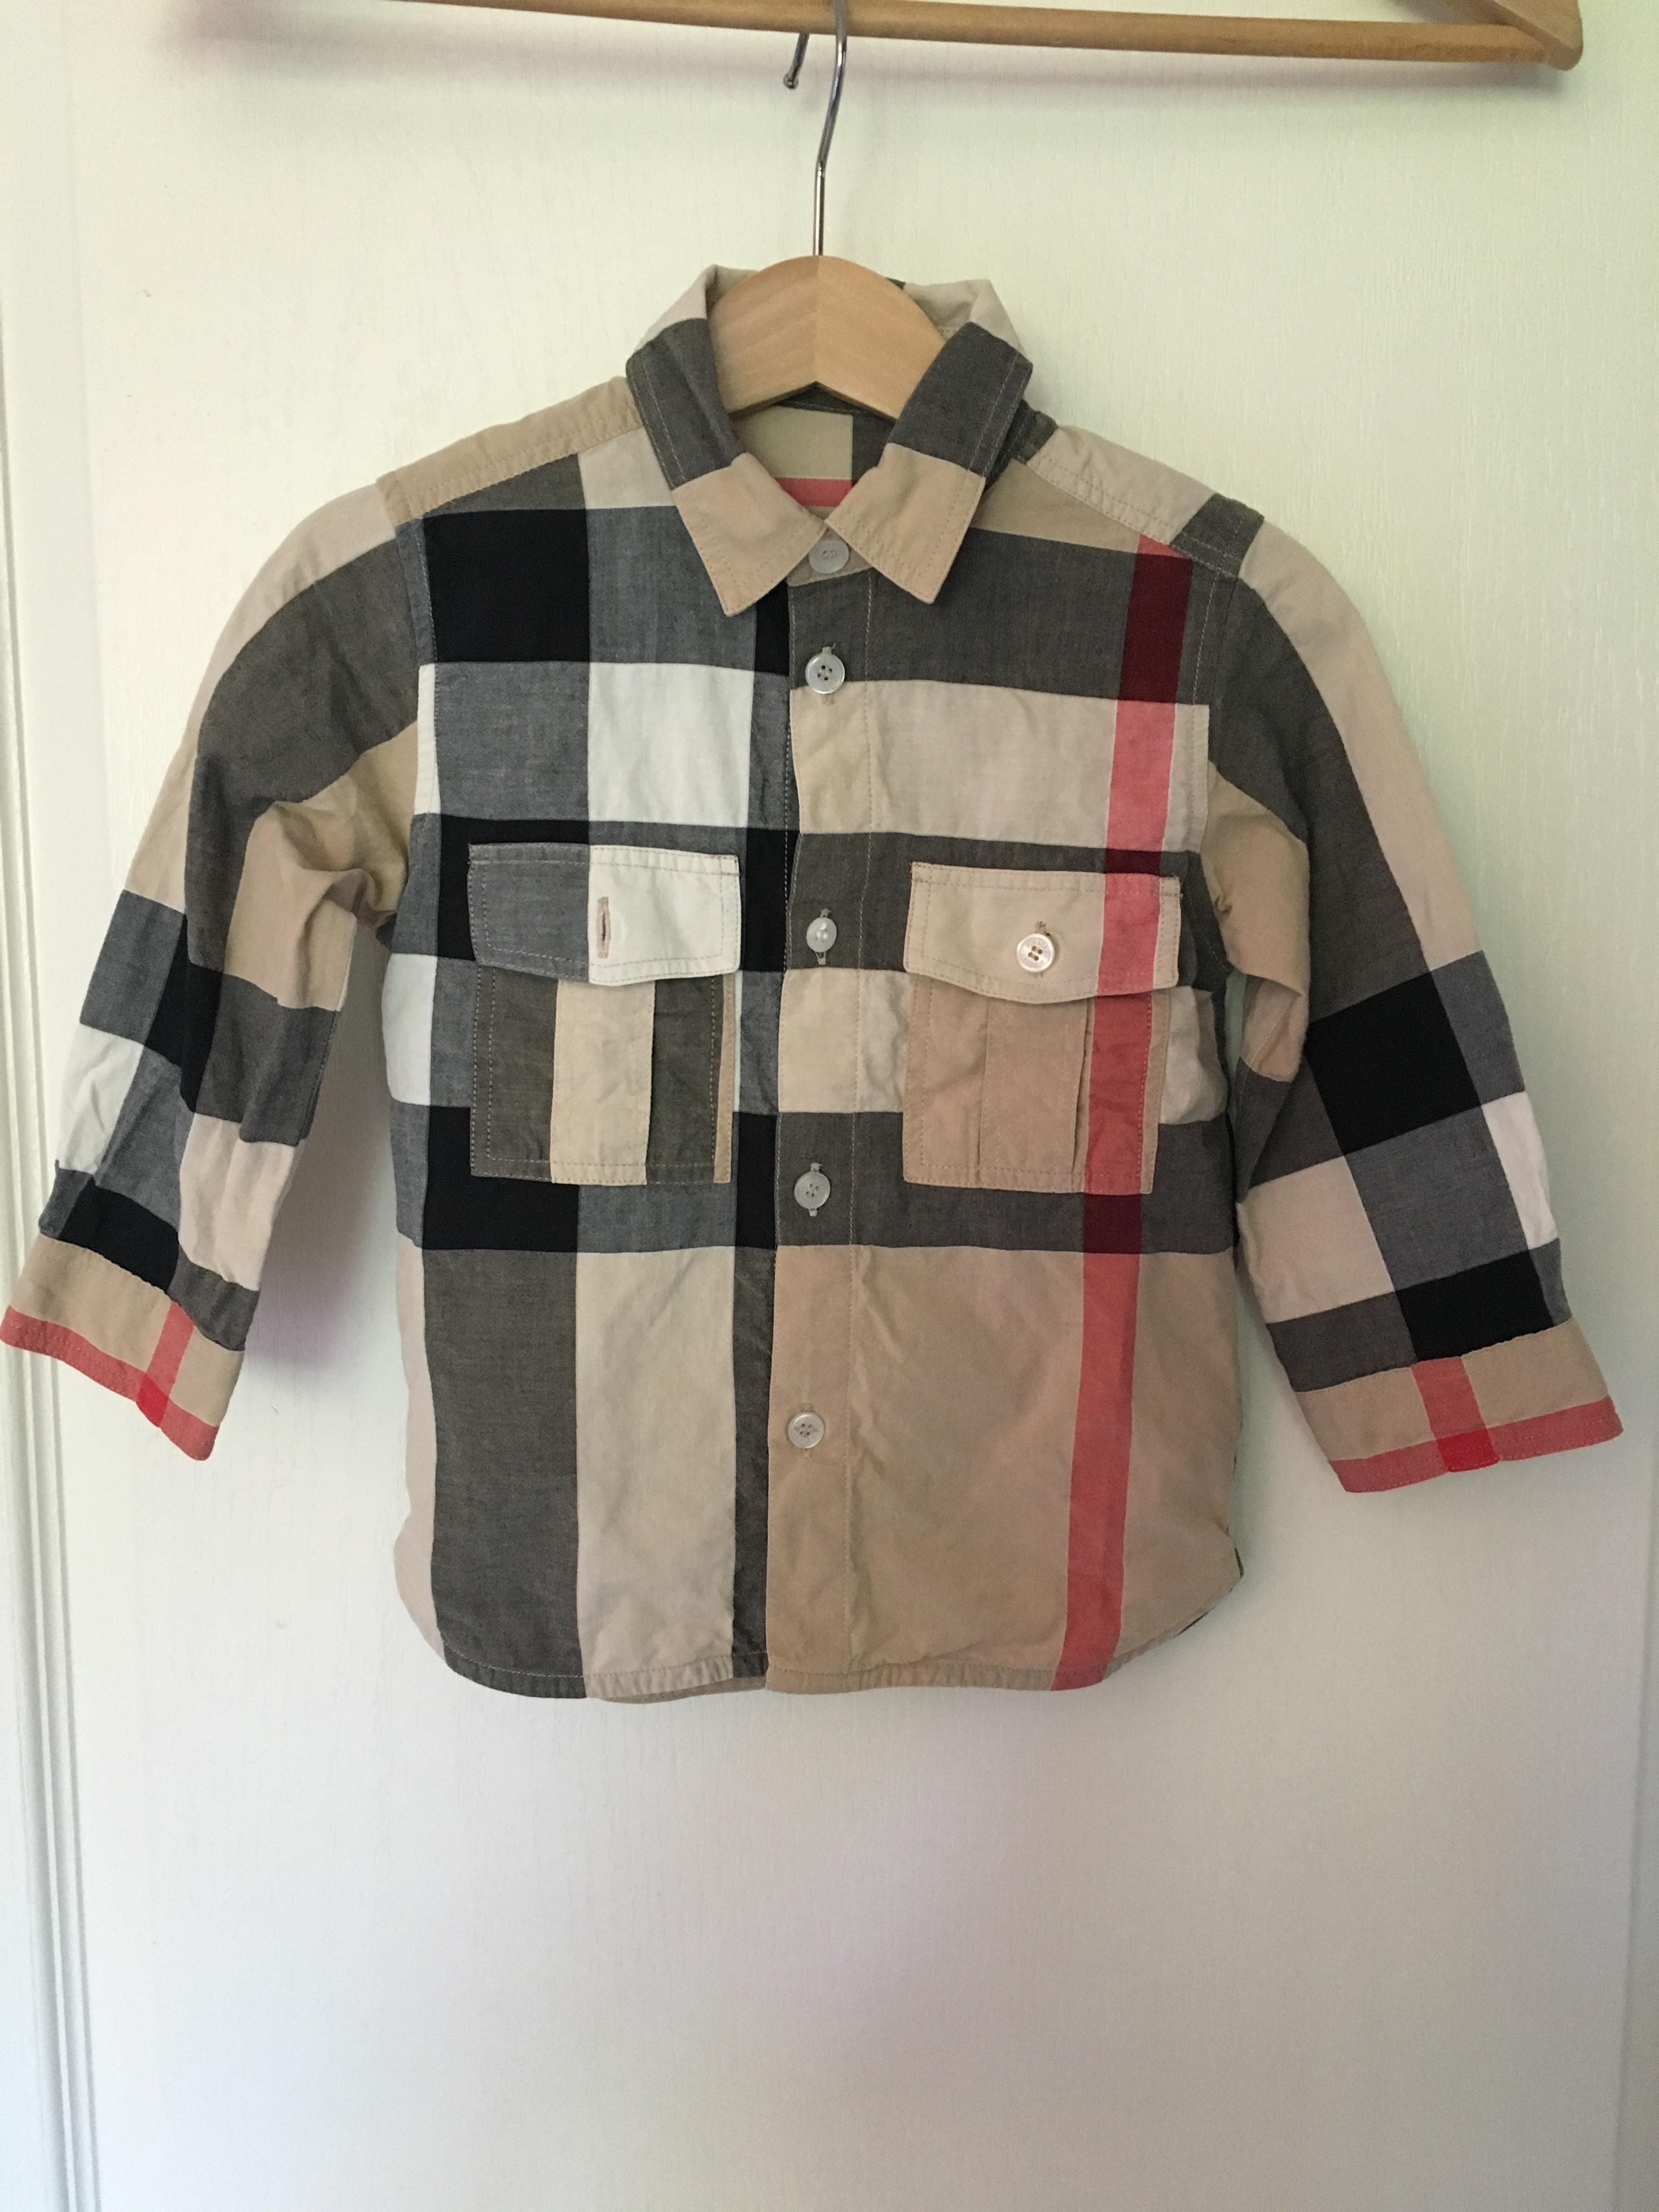 Acheter chemise burberry bebe garcon pas cher 57fde4f2bc5c